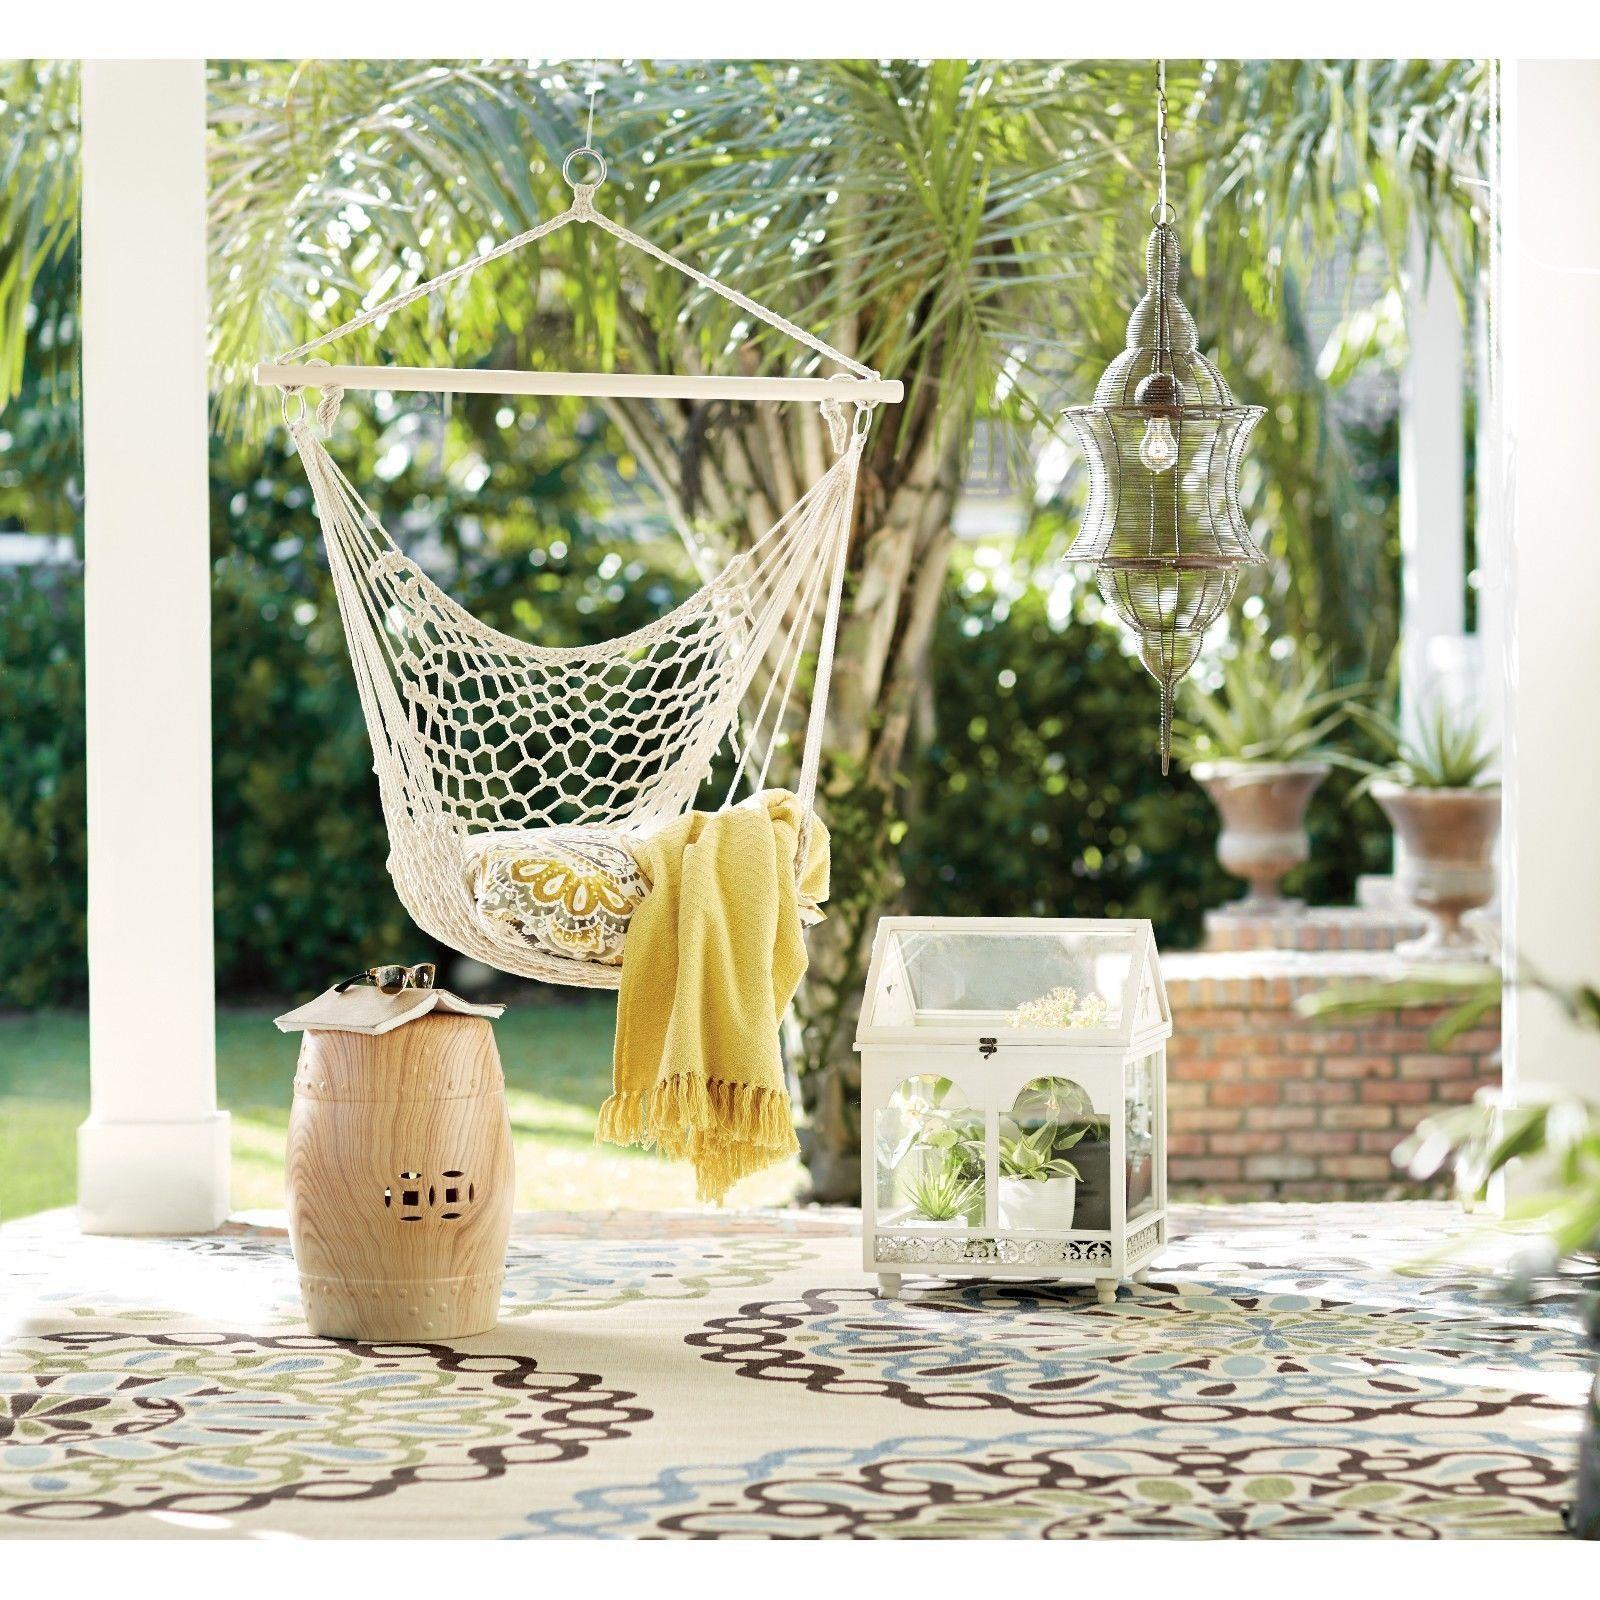 Outdoor Hanging Swing Cotton Hammock Chair $26.39